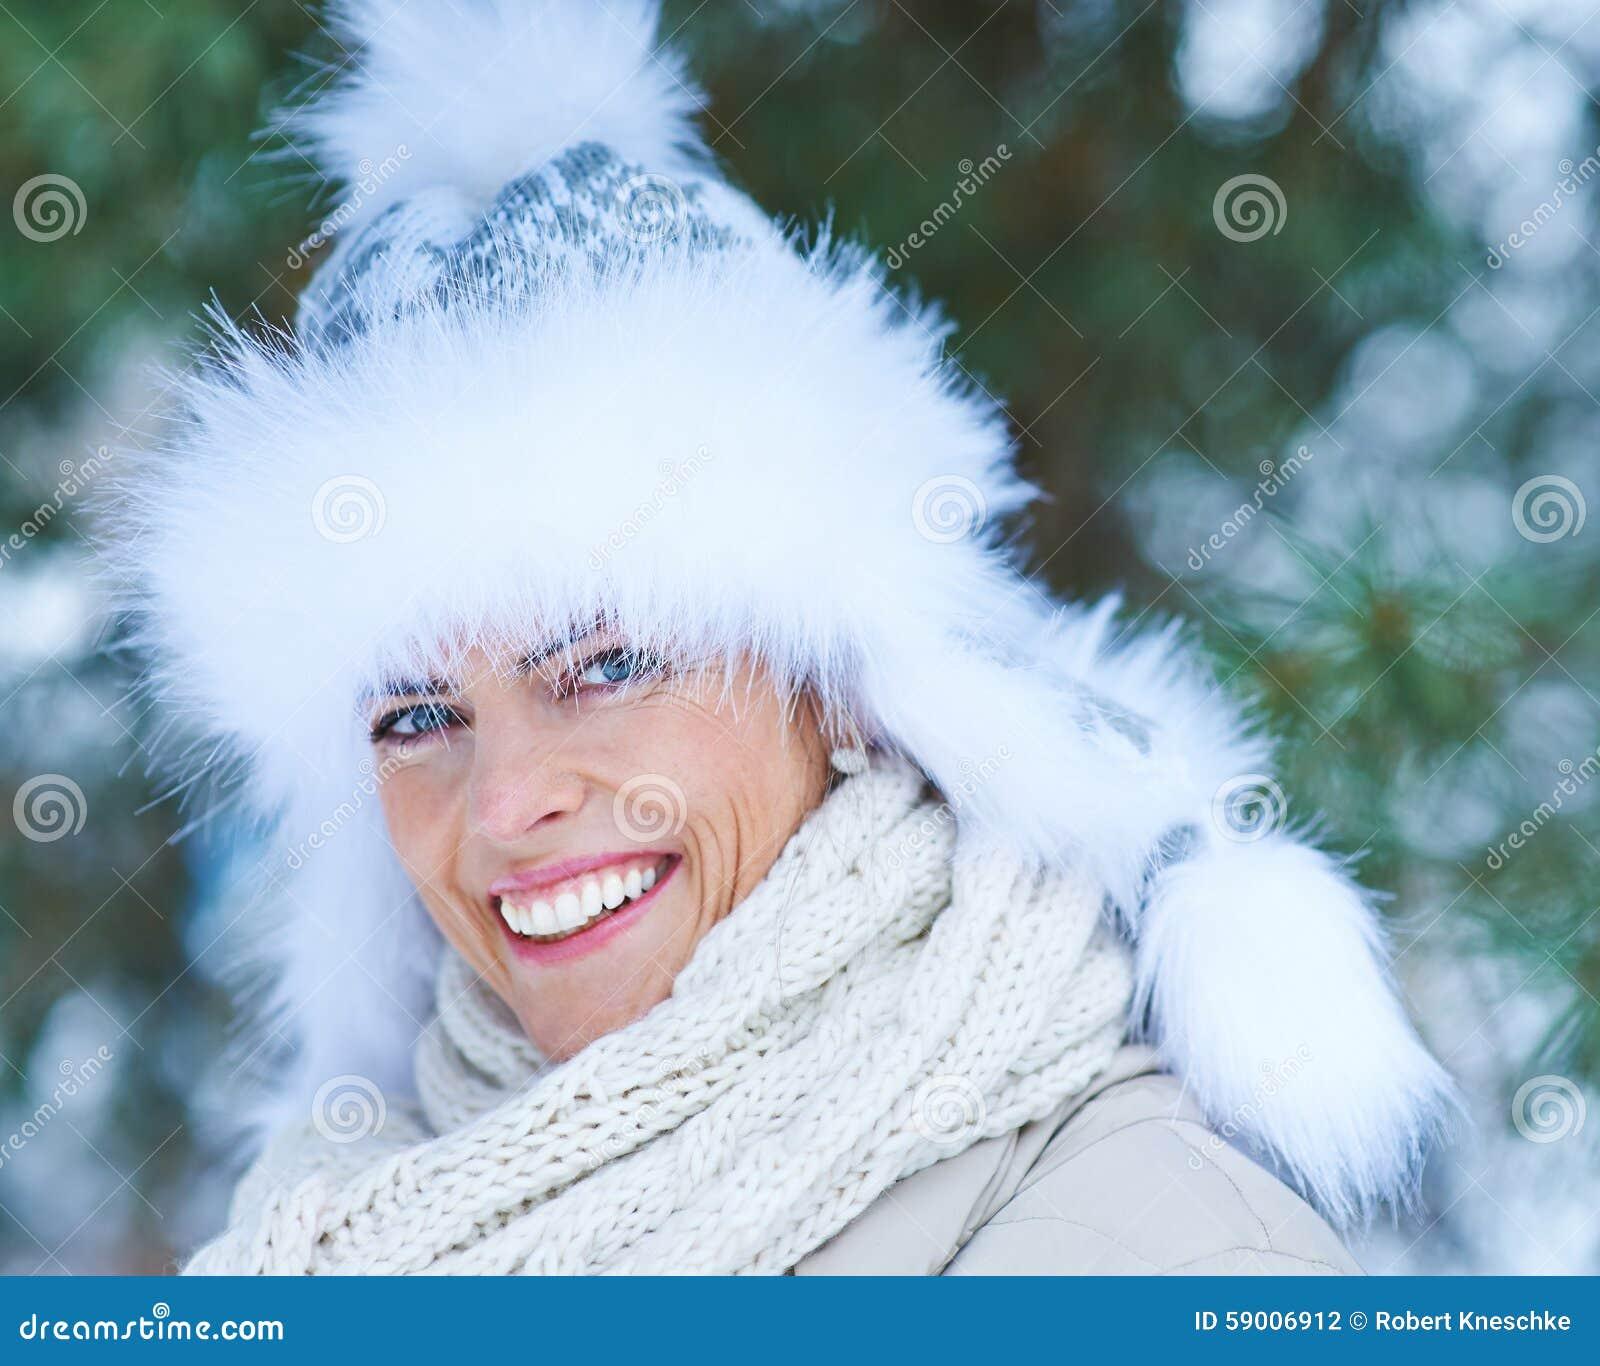 in winter fur - photo #34